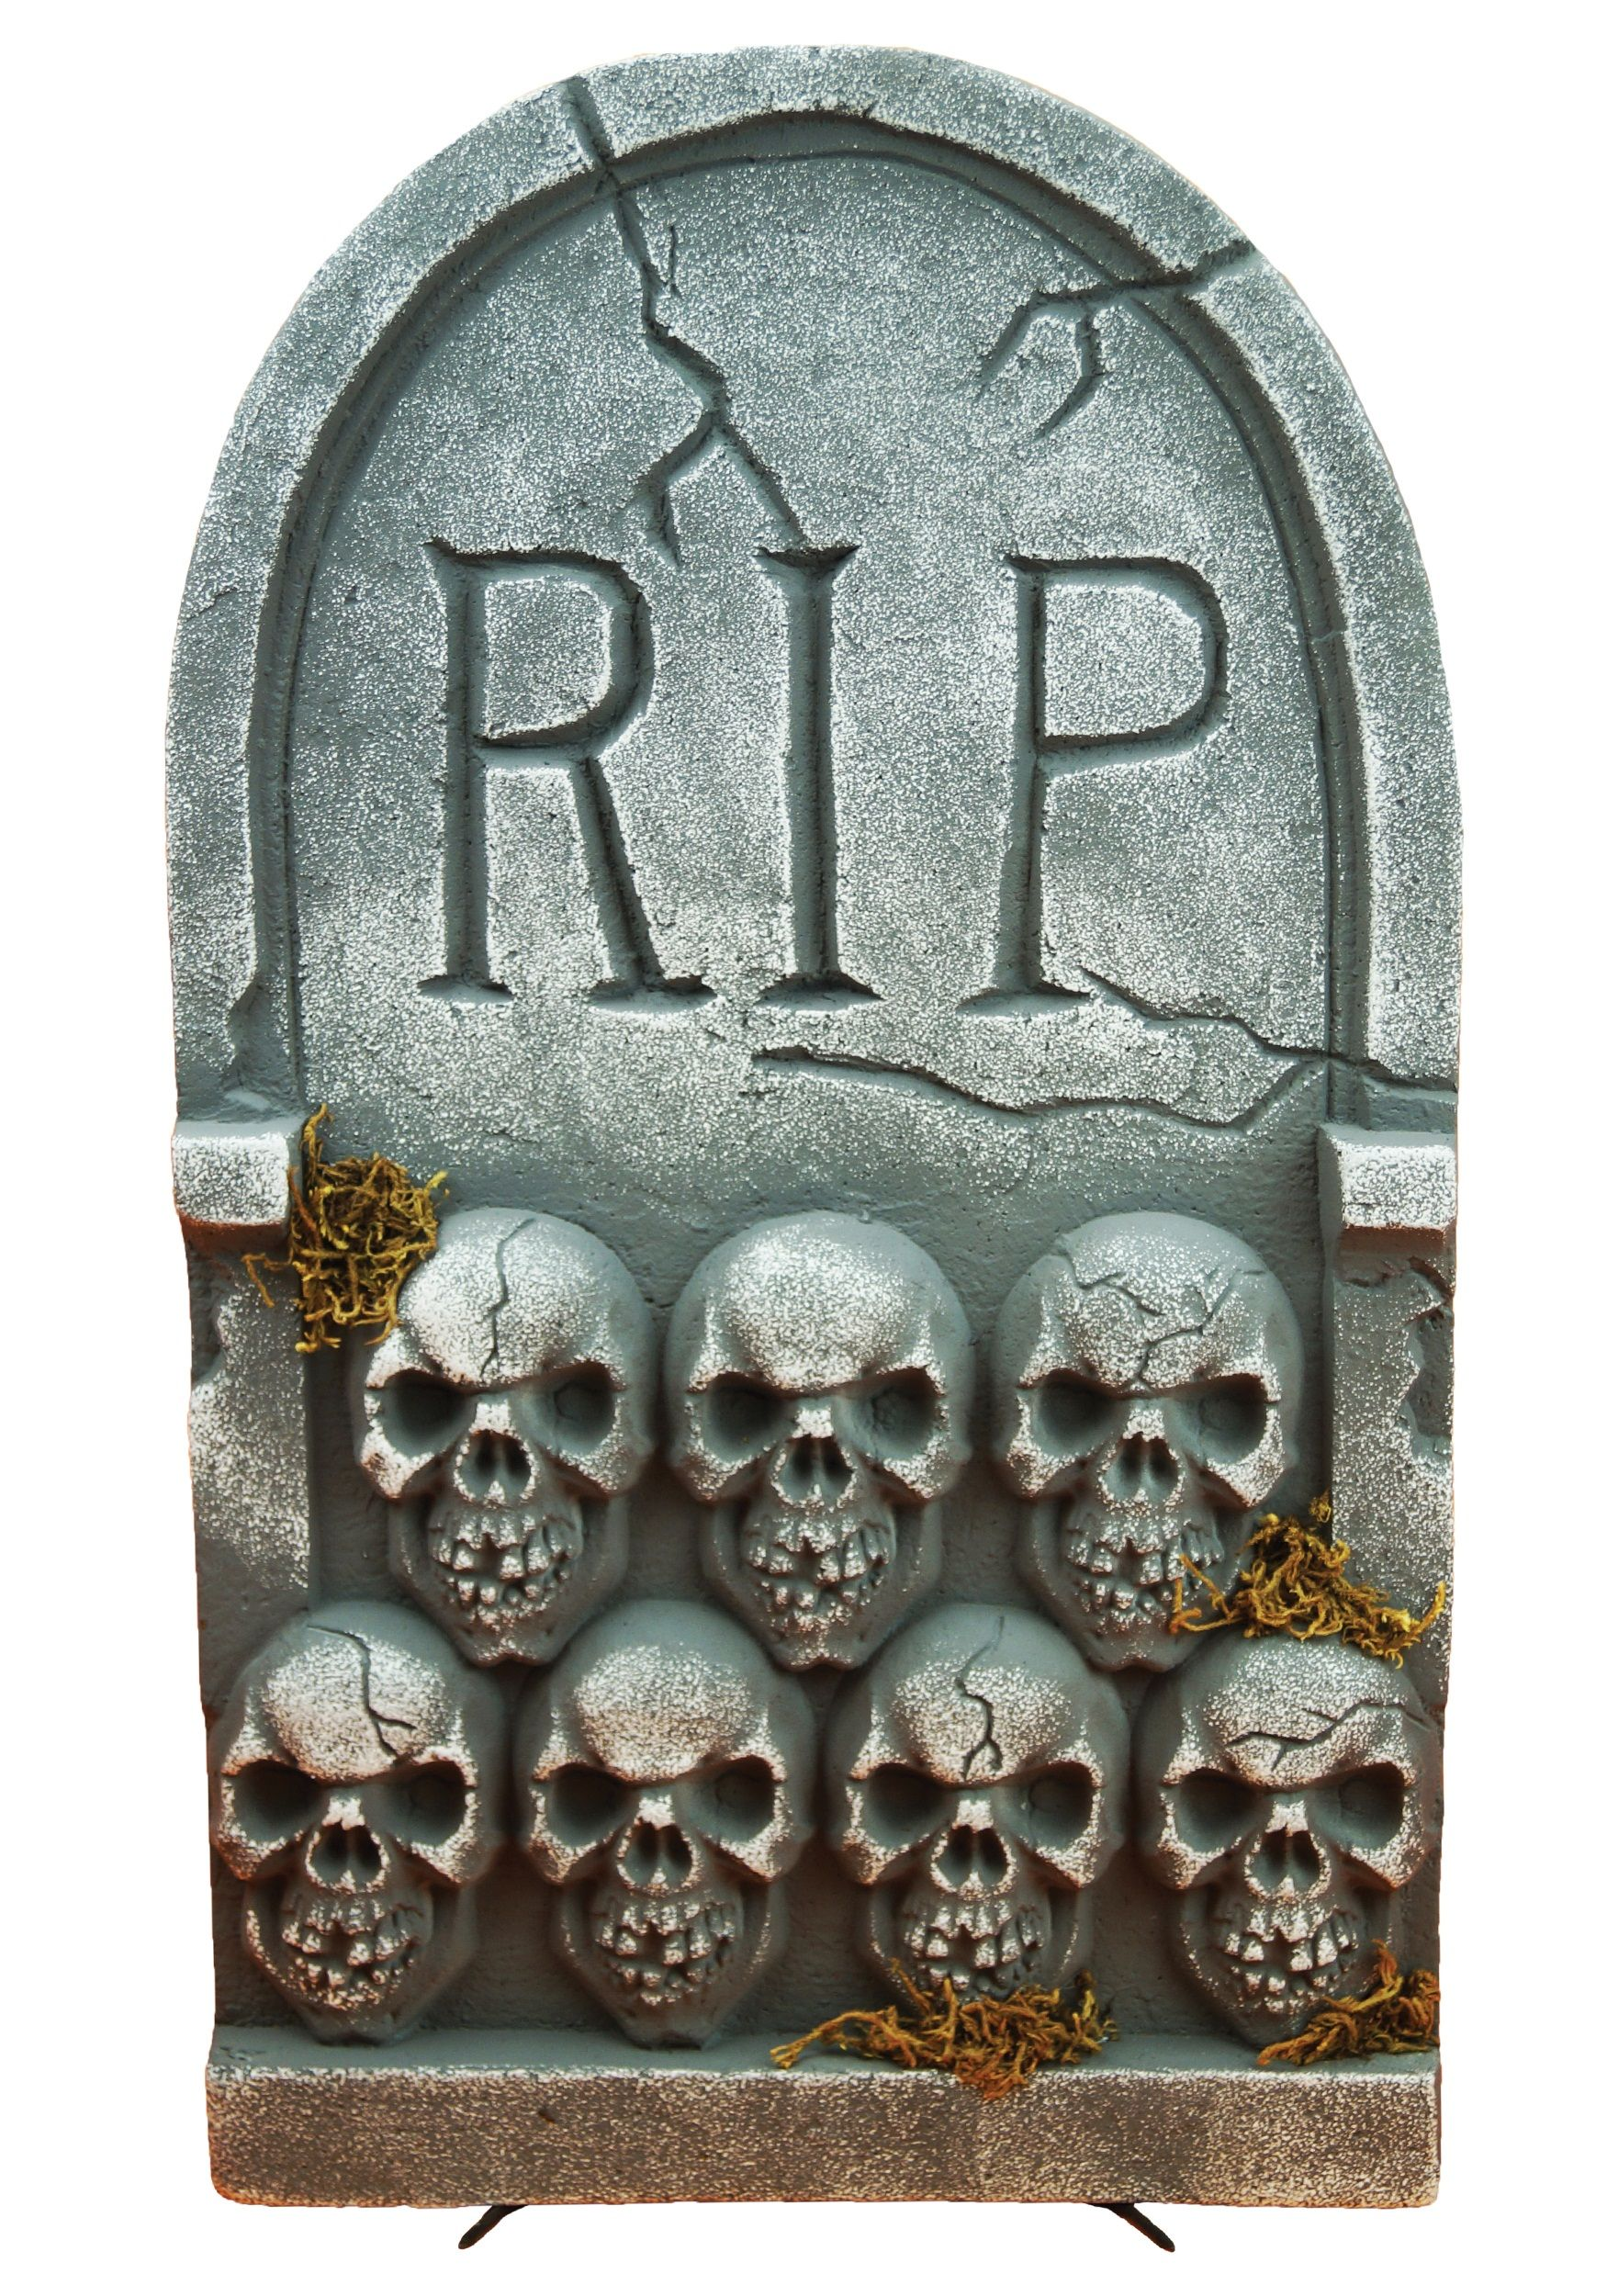 explore rip tombstone halloween tombstones and more - Halloween Tombstone Decorations